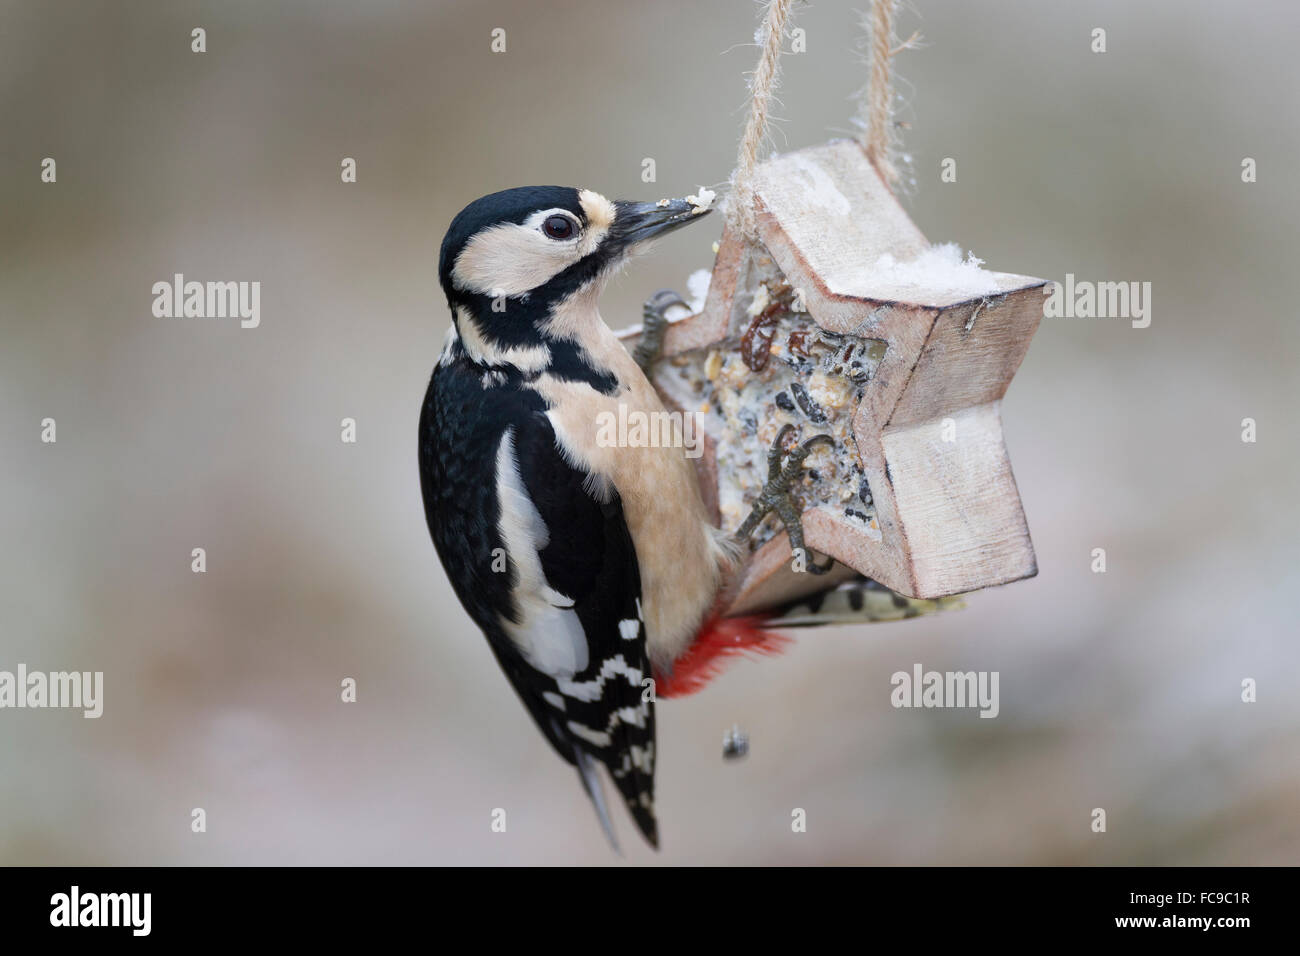 Great spotted woodpecker, bird's feeding, Buntspecht, Vogelfütterung, Fütterung, Dendrocopos major, - Stock Image